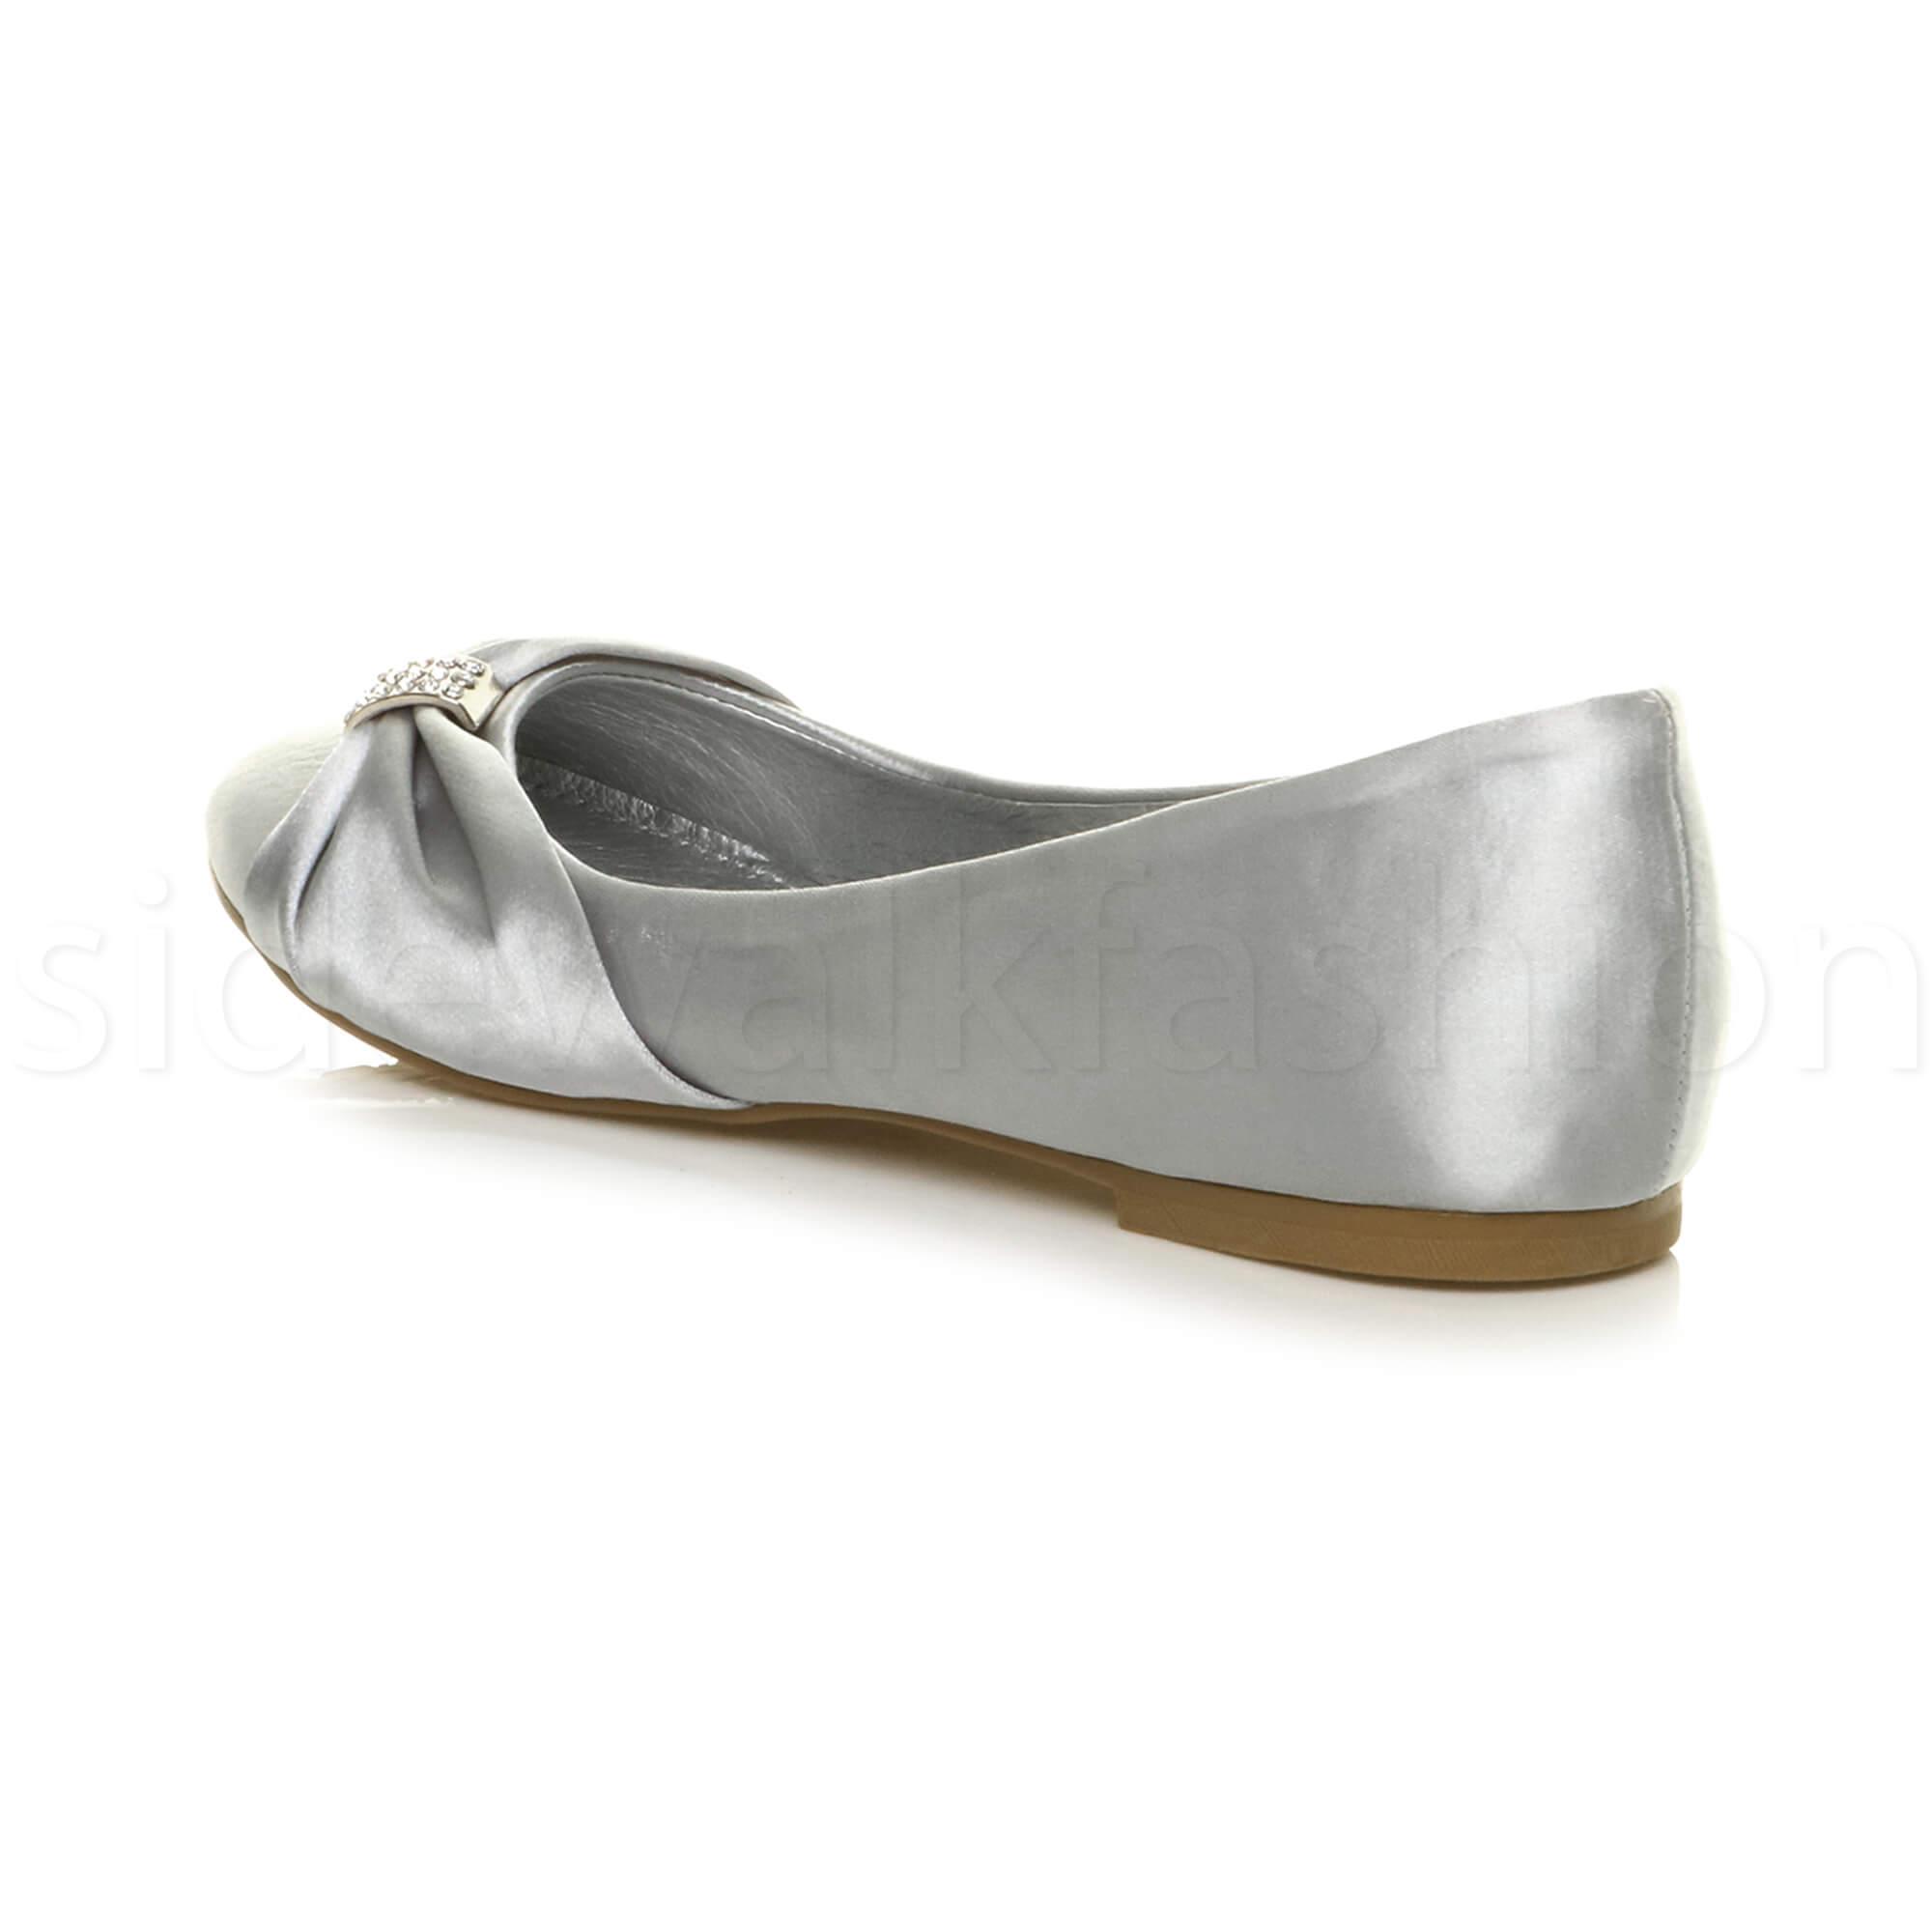 Womens-ladies-flat-wedding-bridesmaid-ruched-diamante-bridal-shoes-pumps-size thumbnail 29